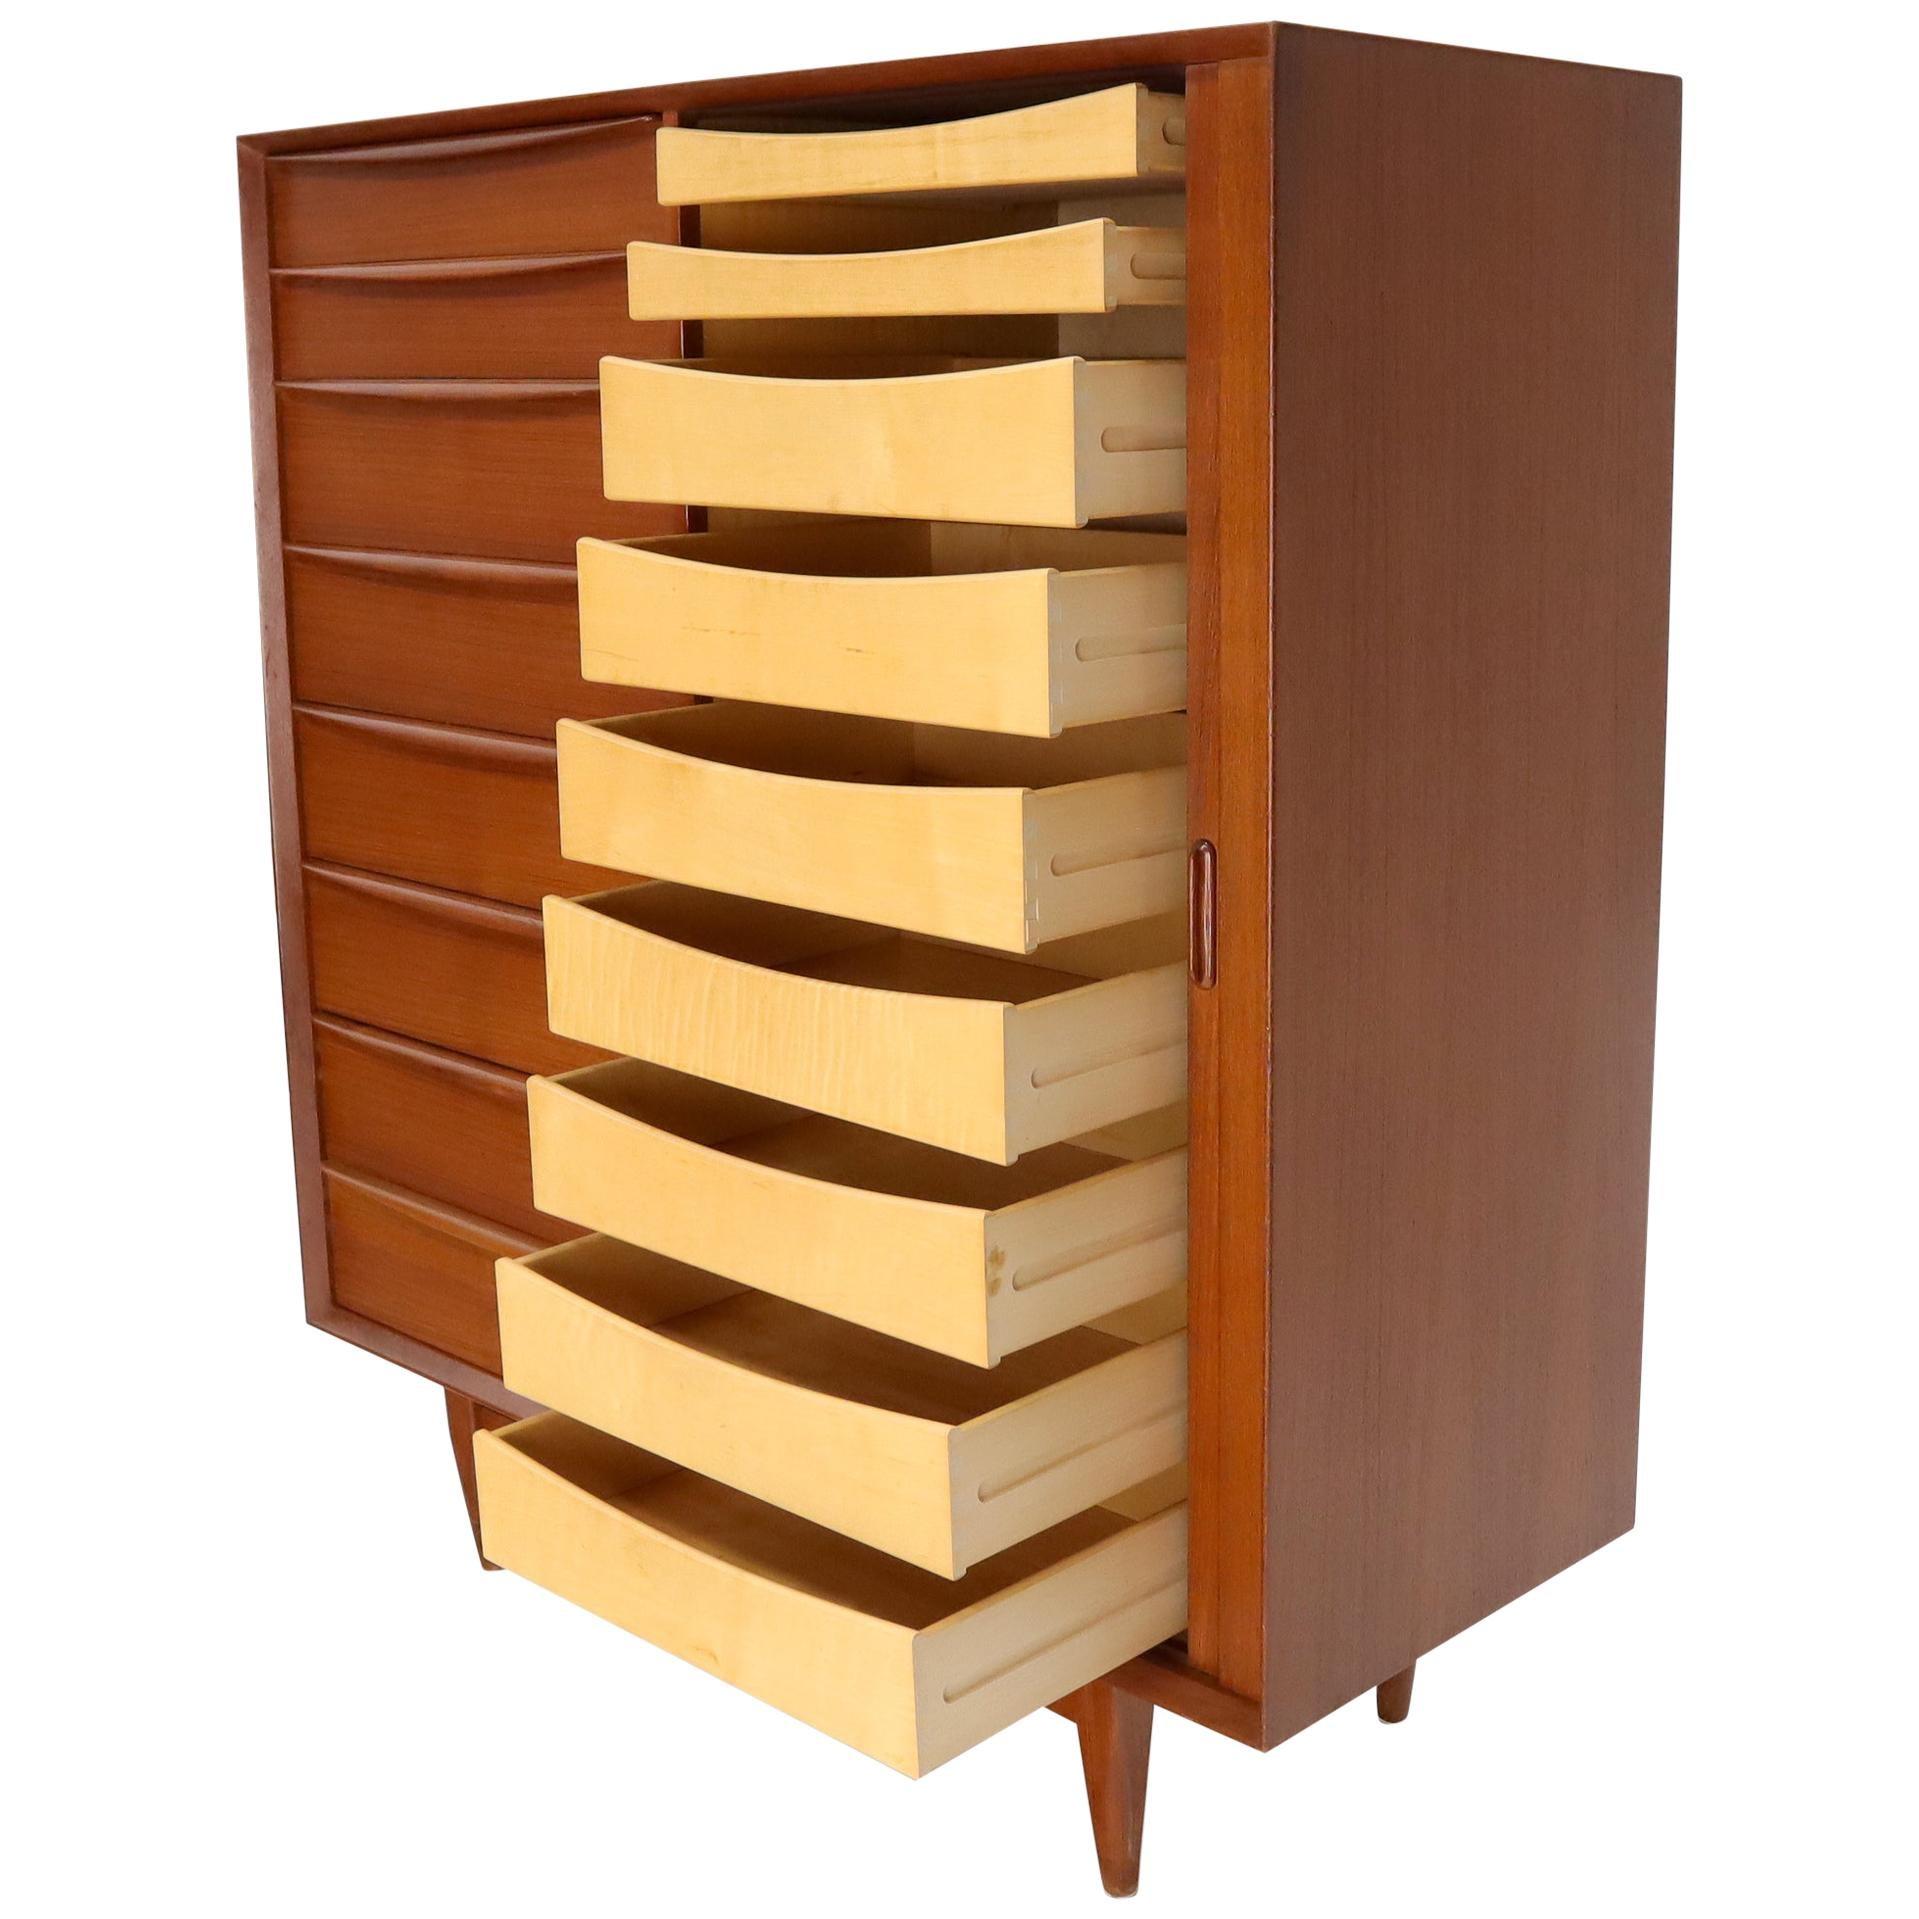 Danish Mid-Century Modern Teak Highboy Dresser Side by Side by Chest Falster